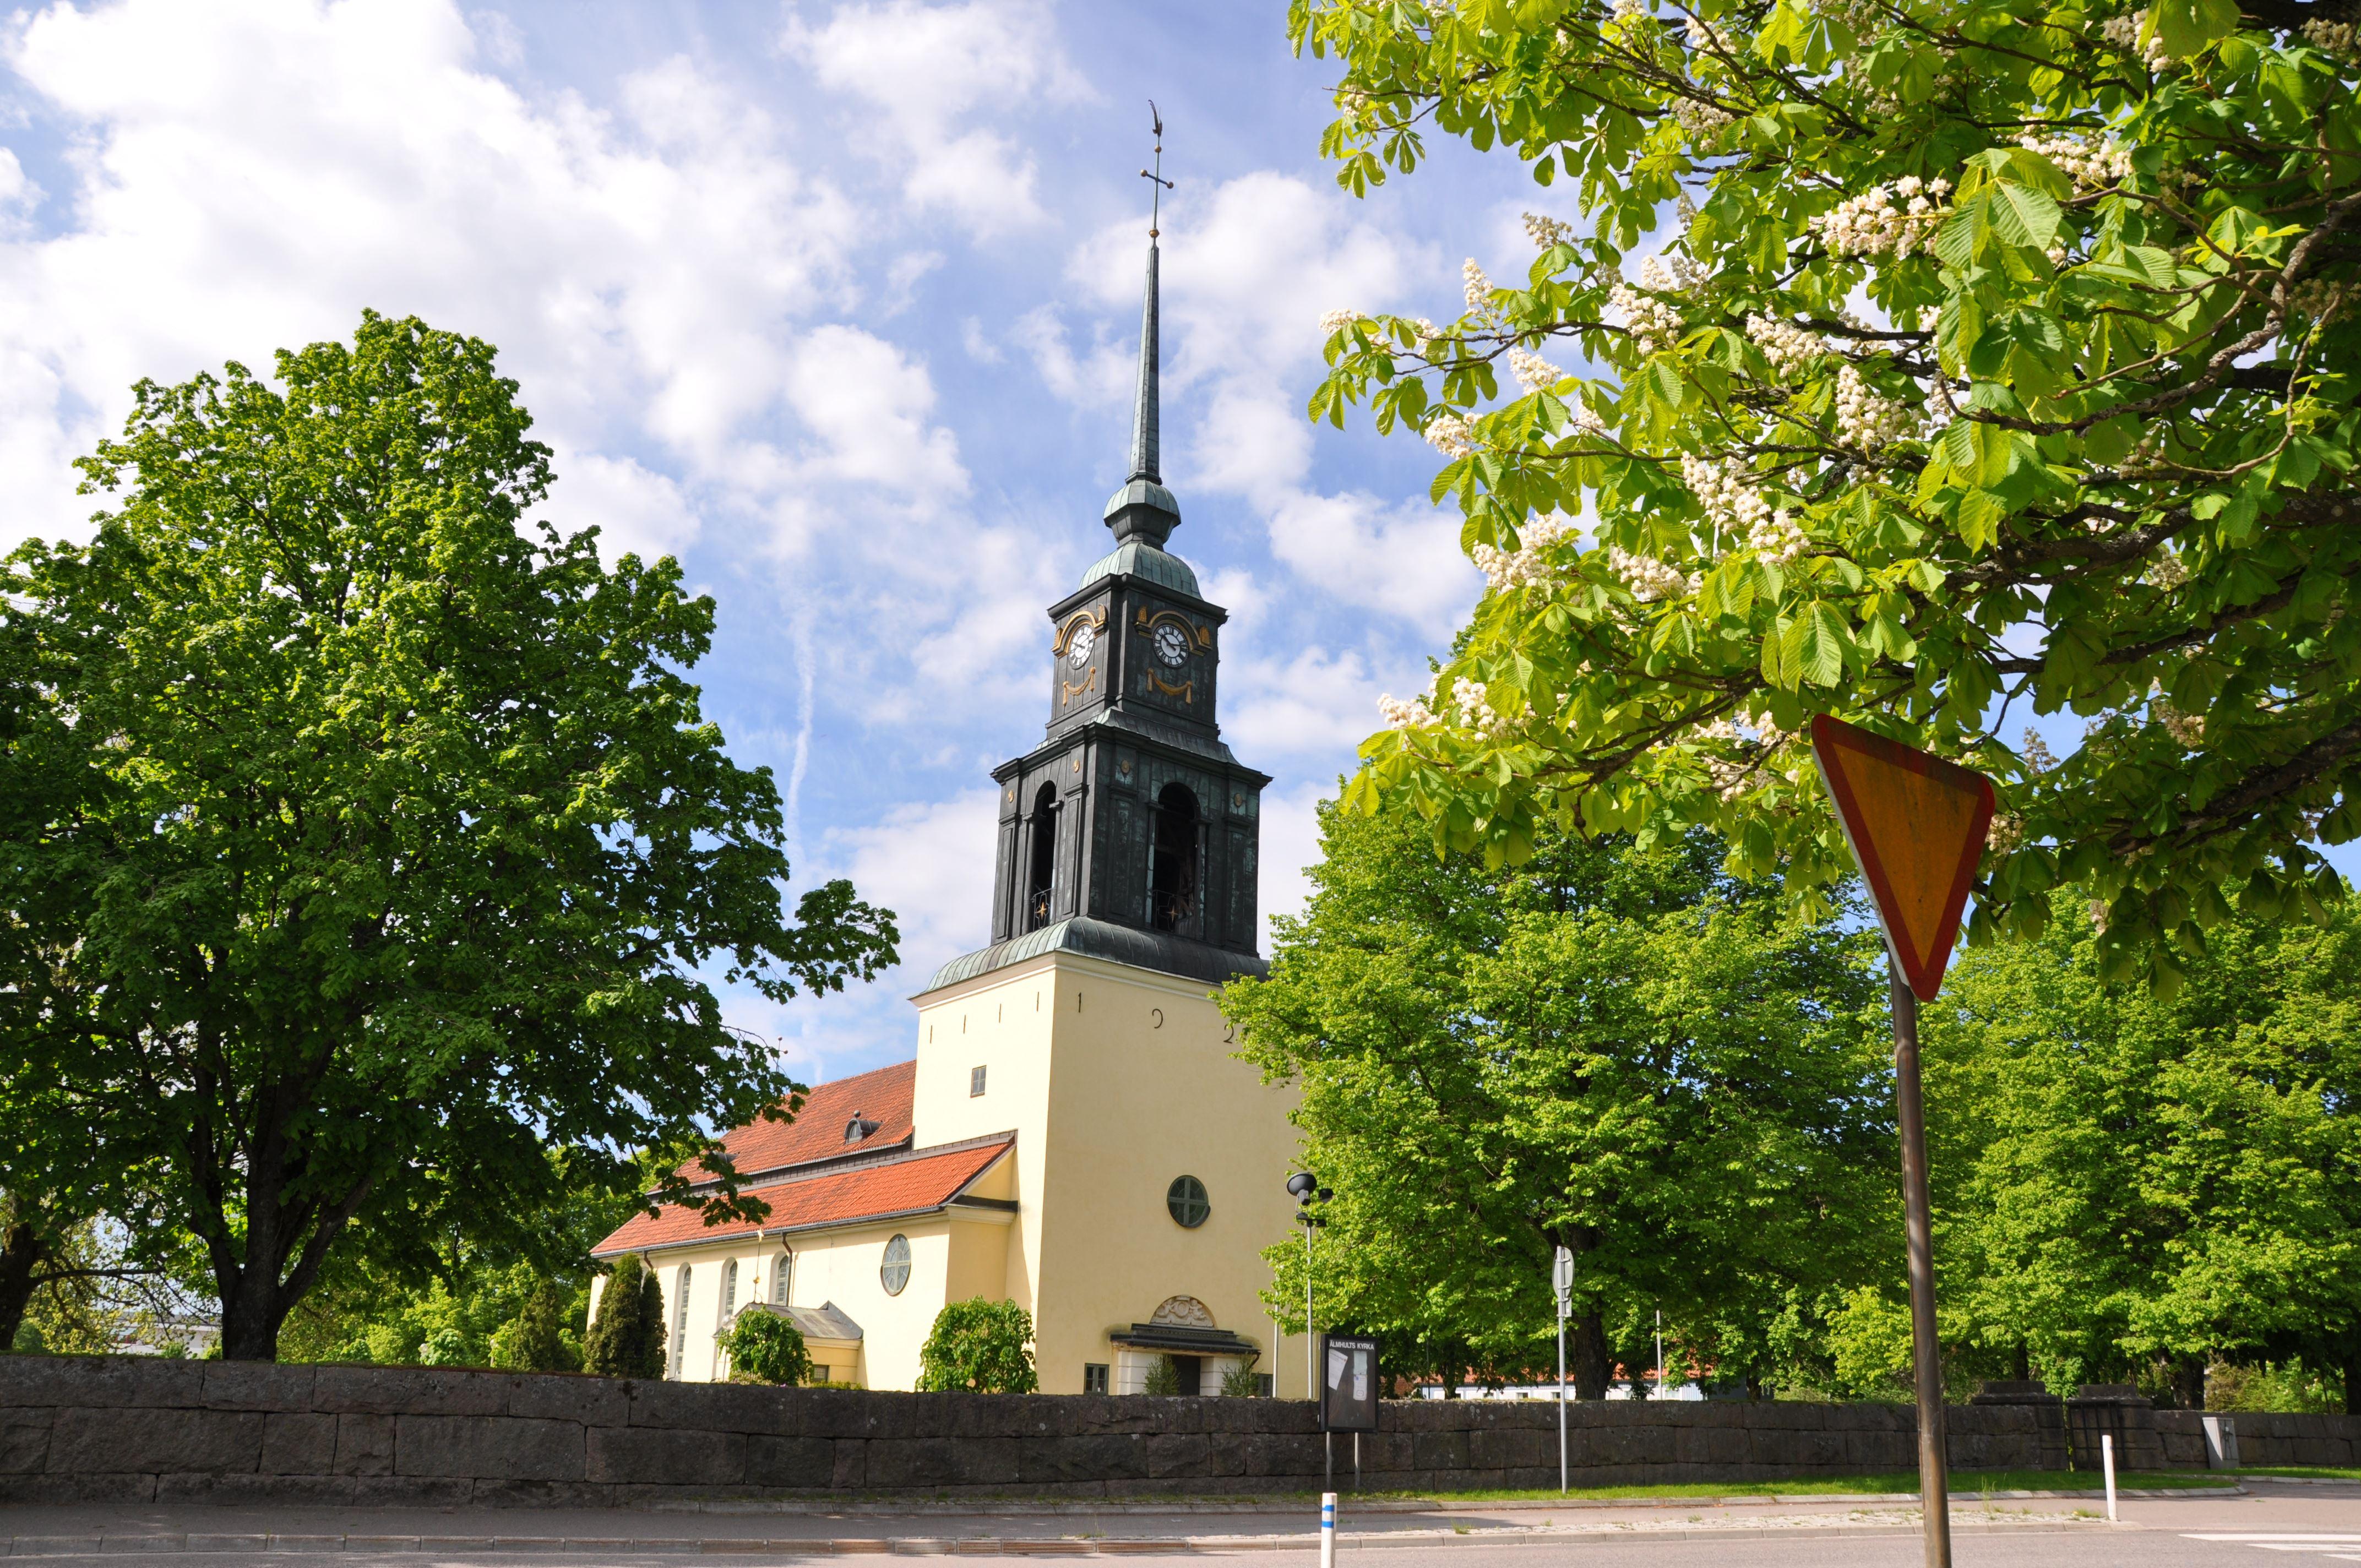 Älmhult Kirche